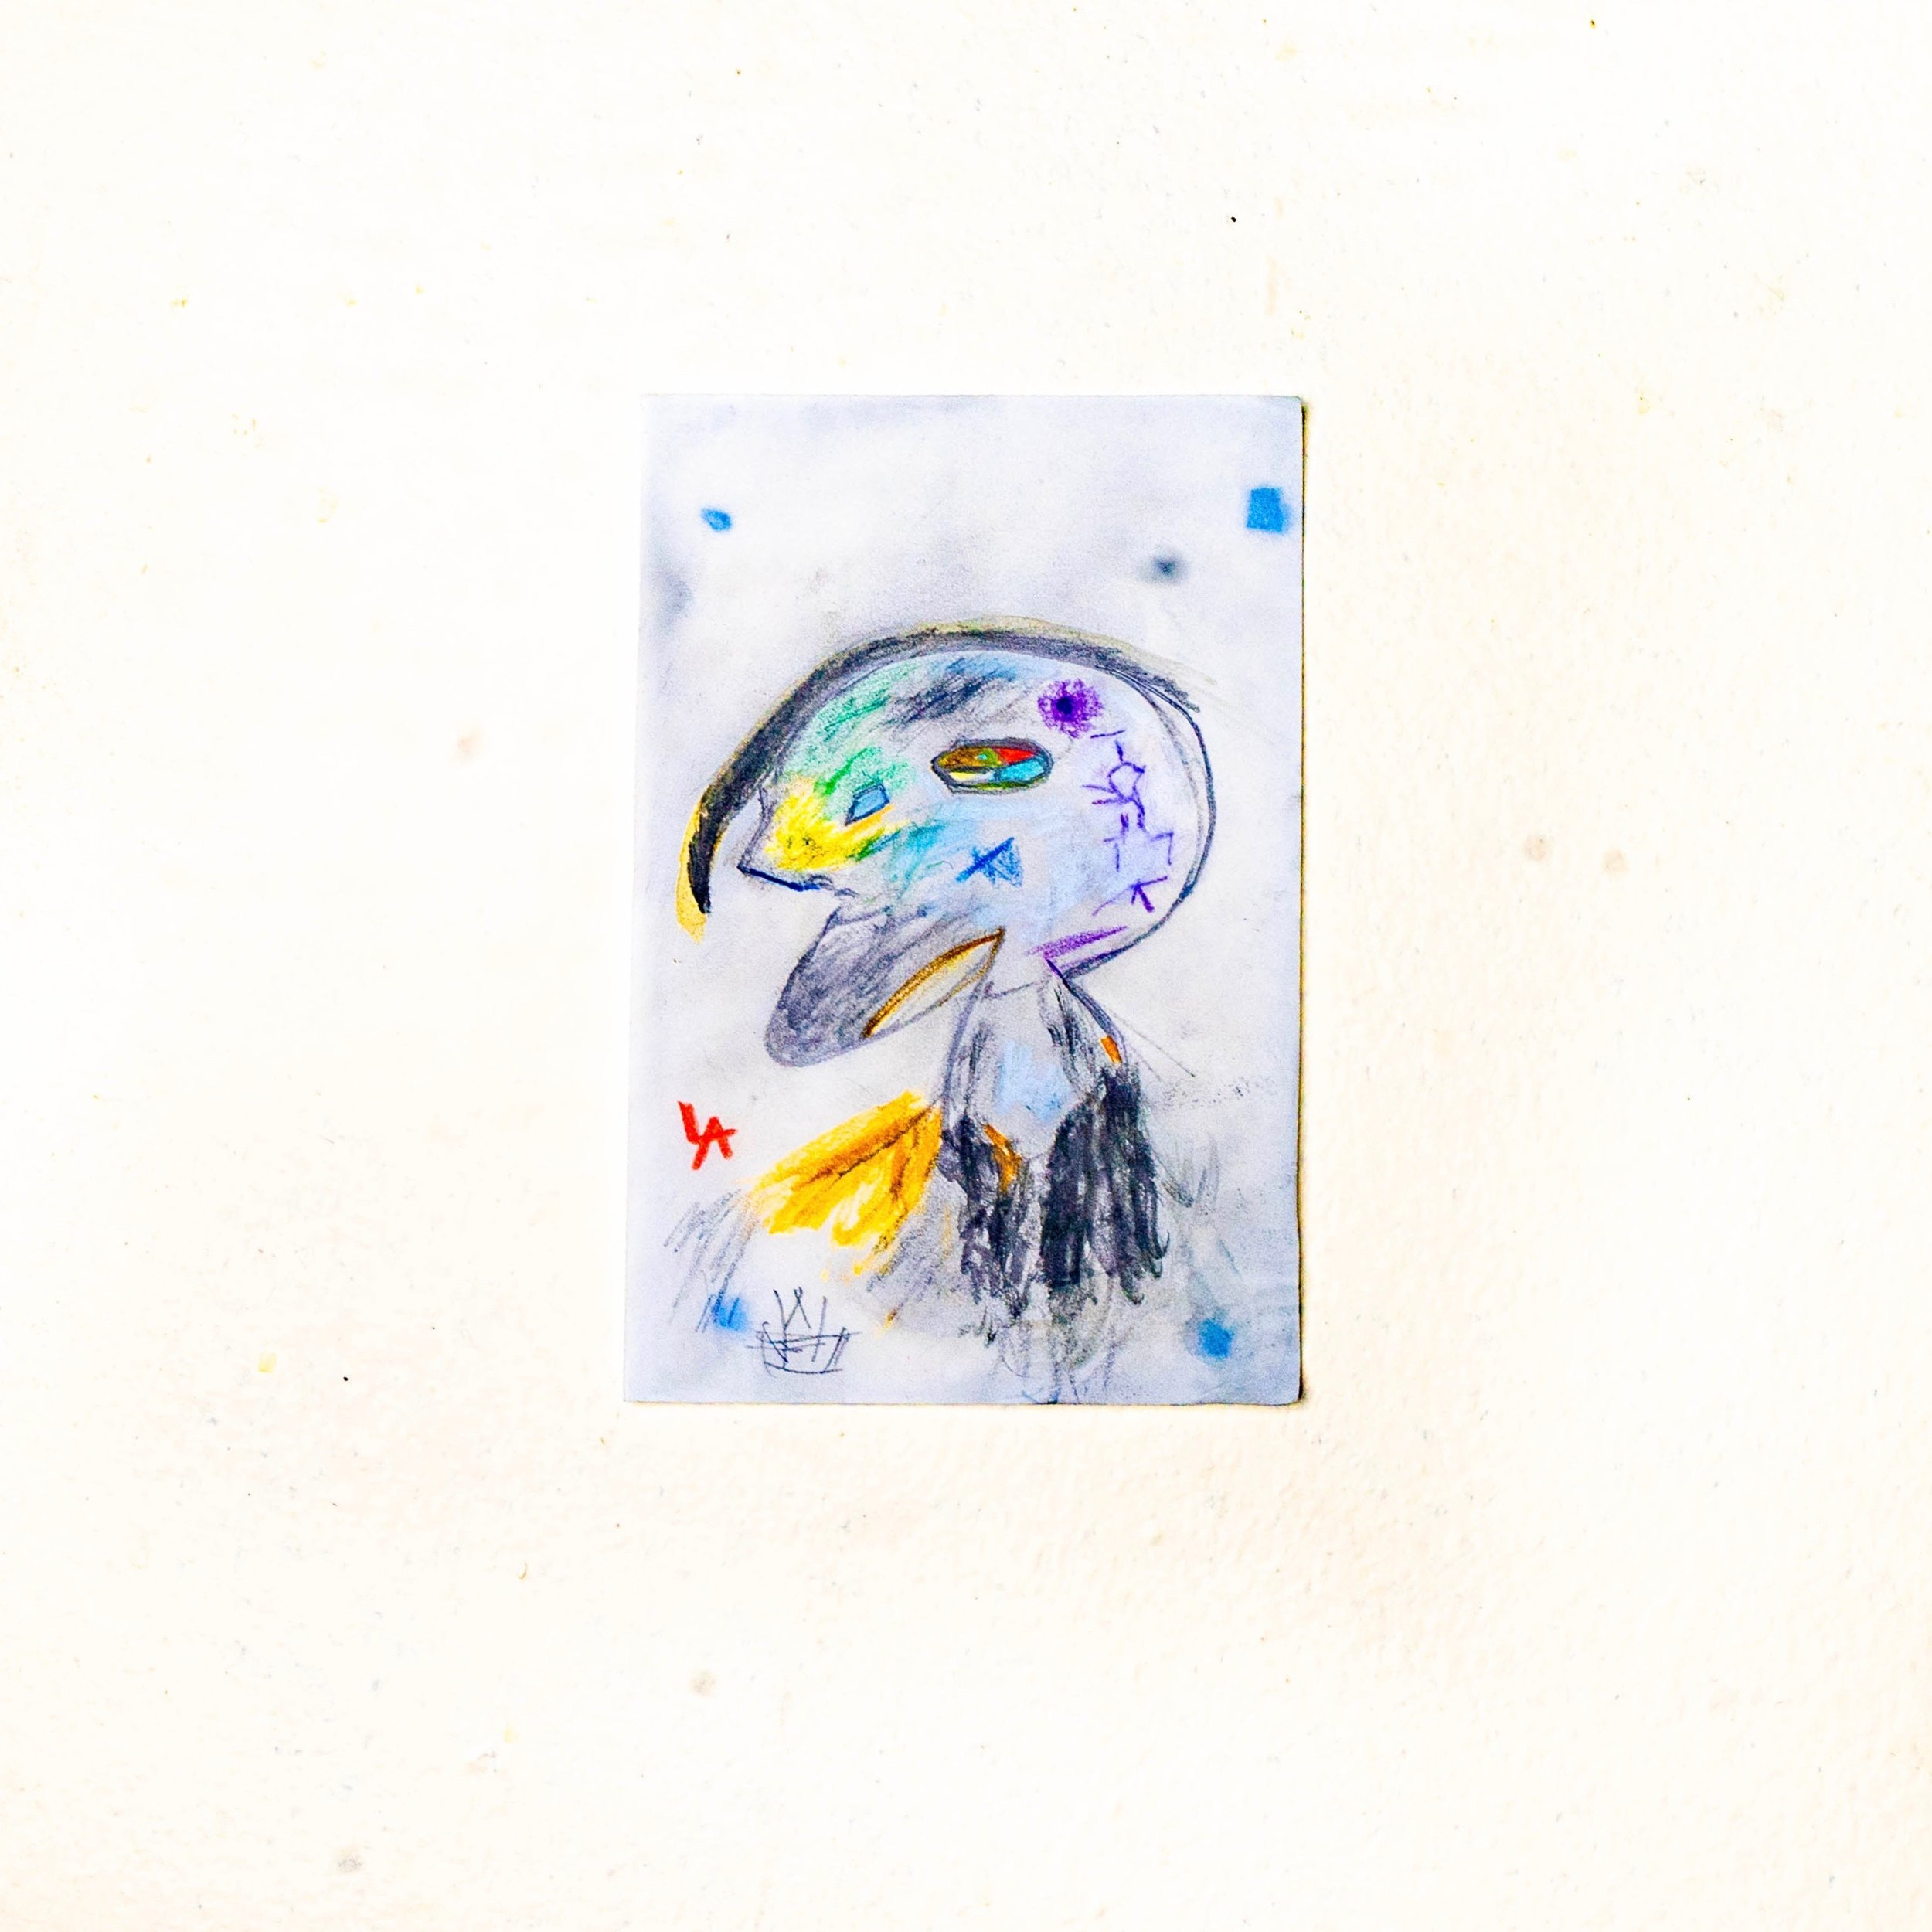 Louis Angel__Tiny Tim__4_x_6 Cotton Paper_Watercolors_2019_$75.jpeg